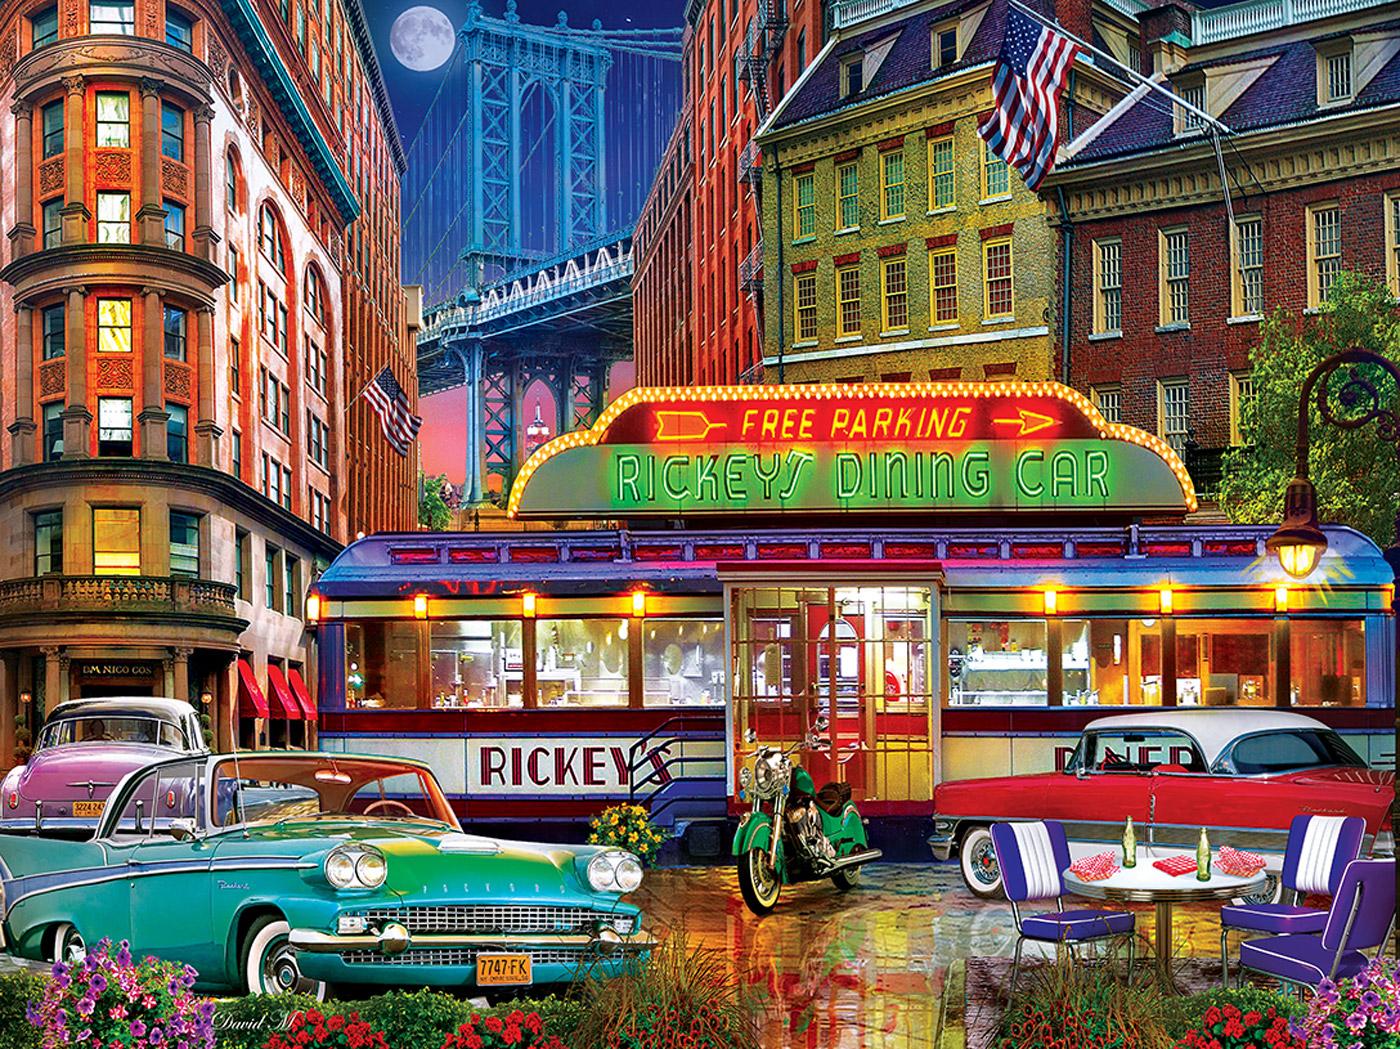 Rickey's Diner Car Street Scene Jigsaw Puzzle